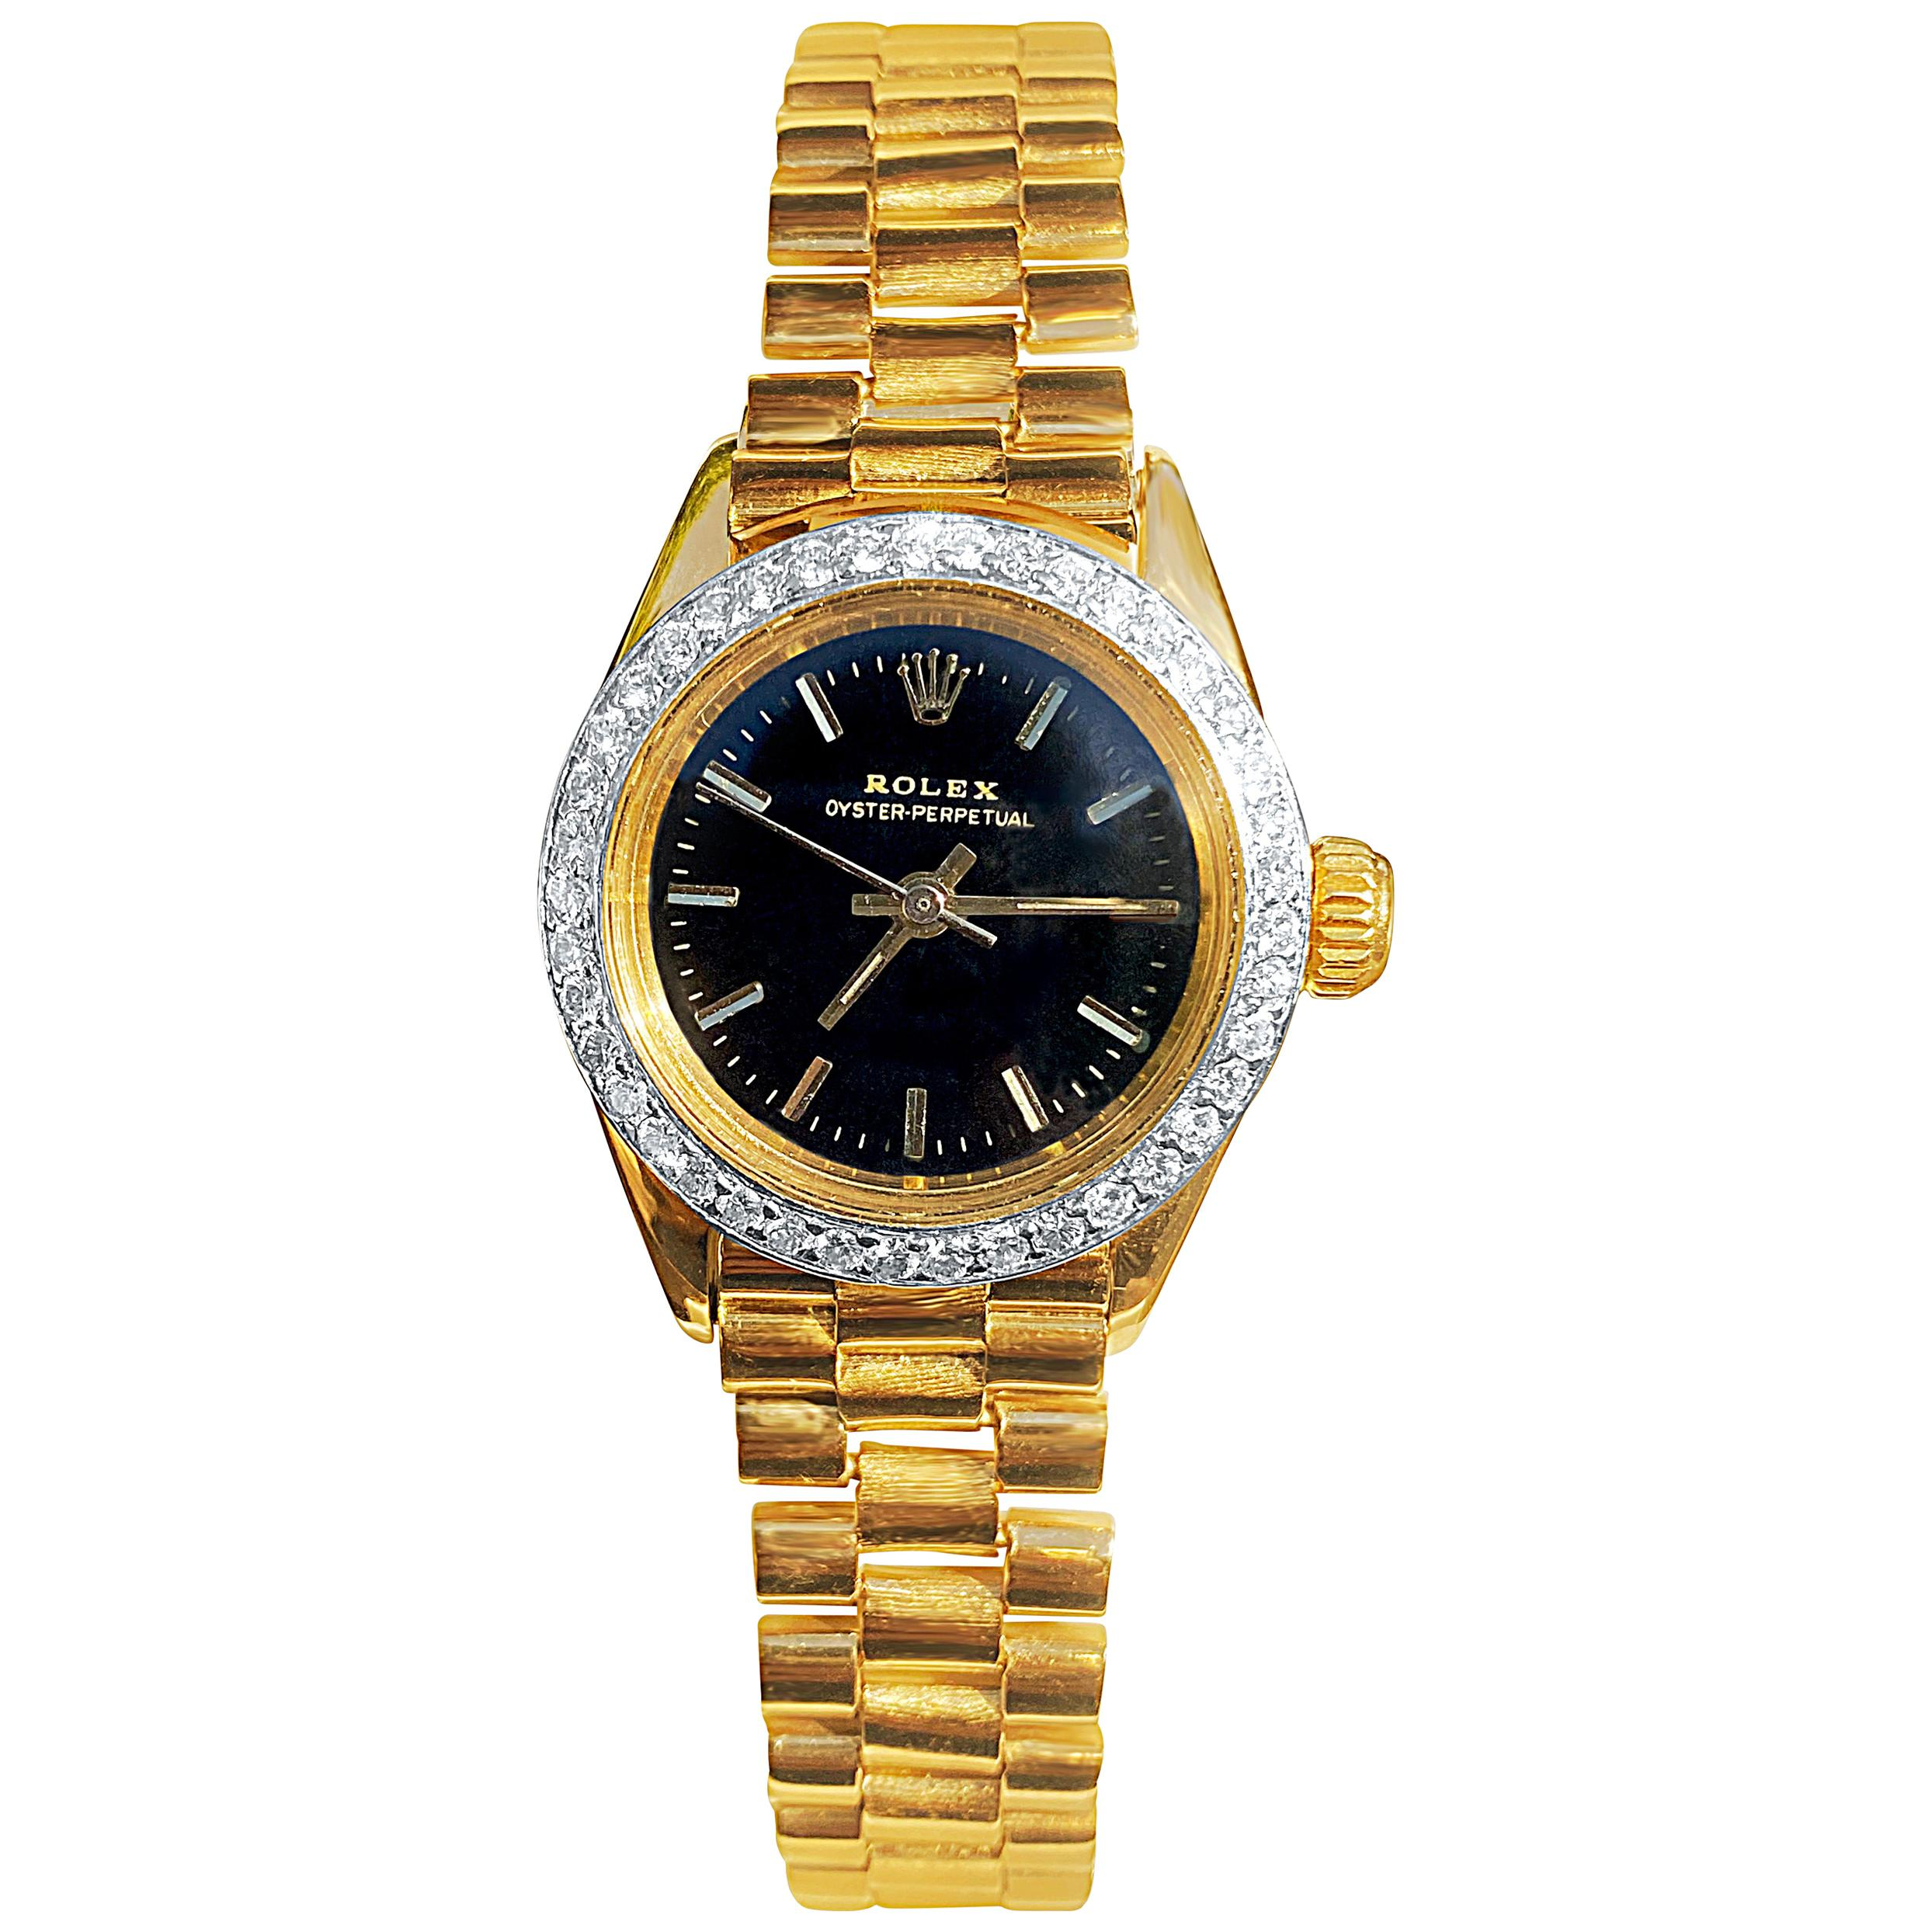 Rolex Oyster Perpetual Black Face/Diamond Bezel Rolex in 18k Yellow Gold